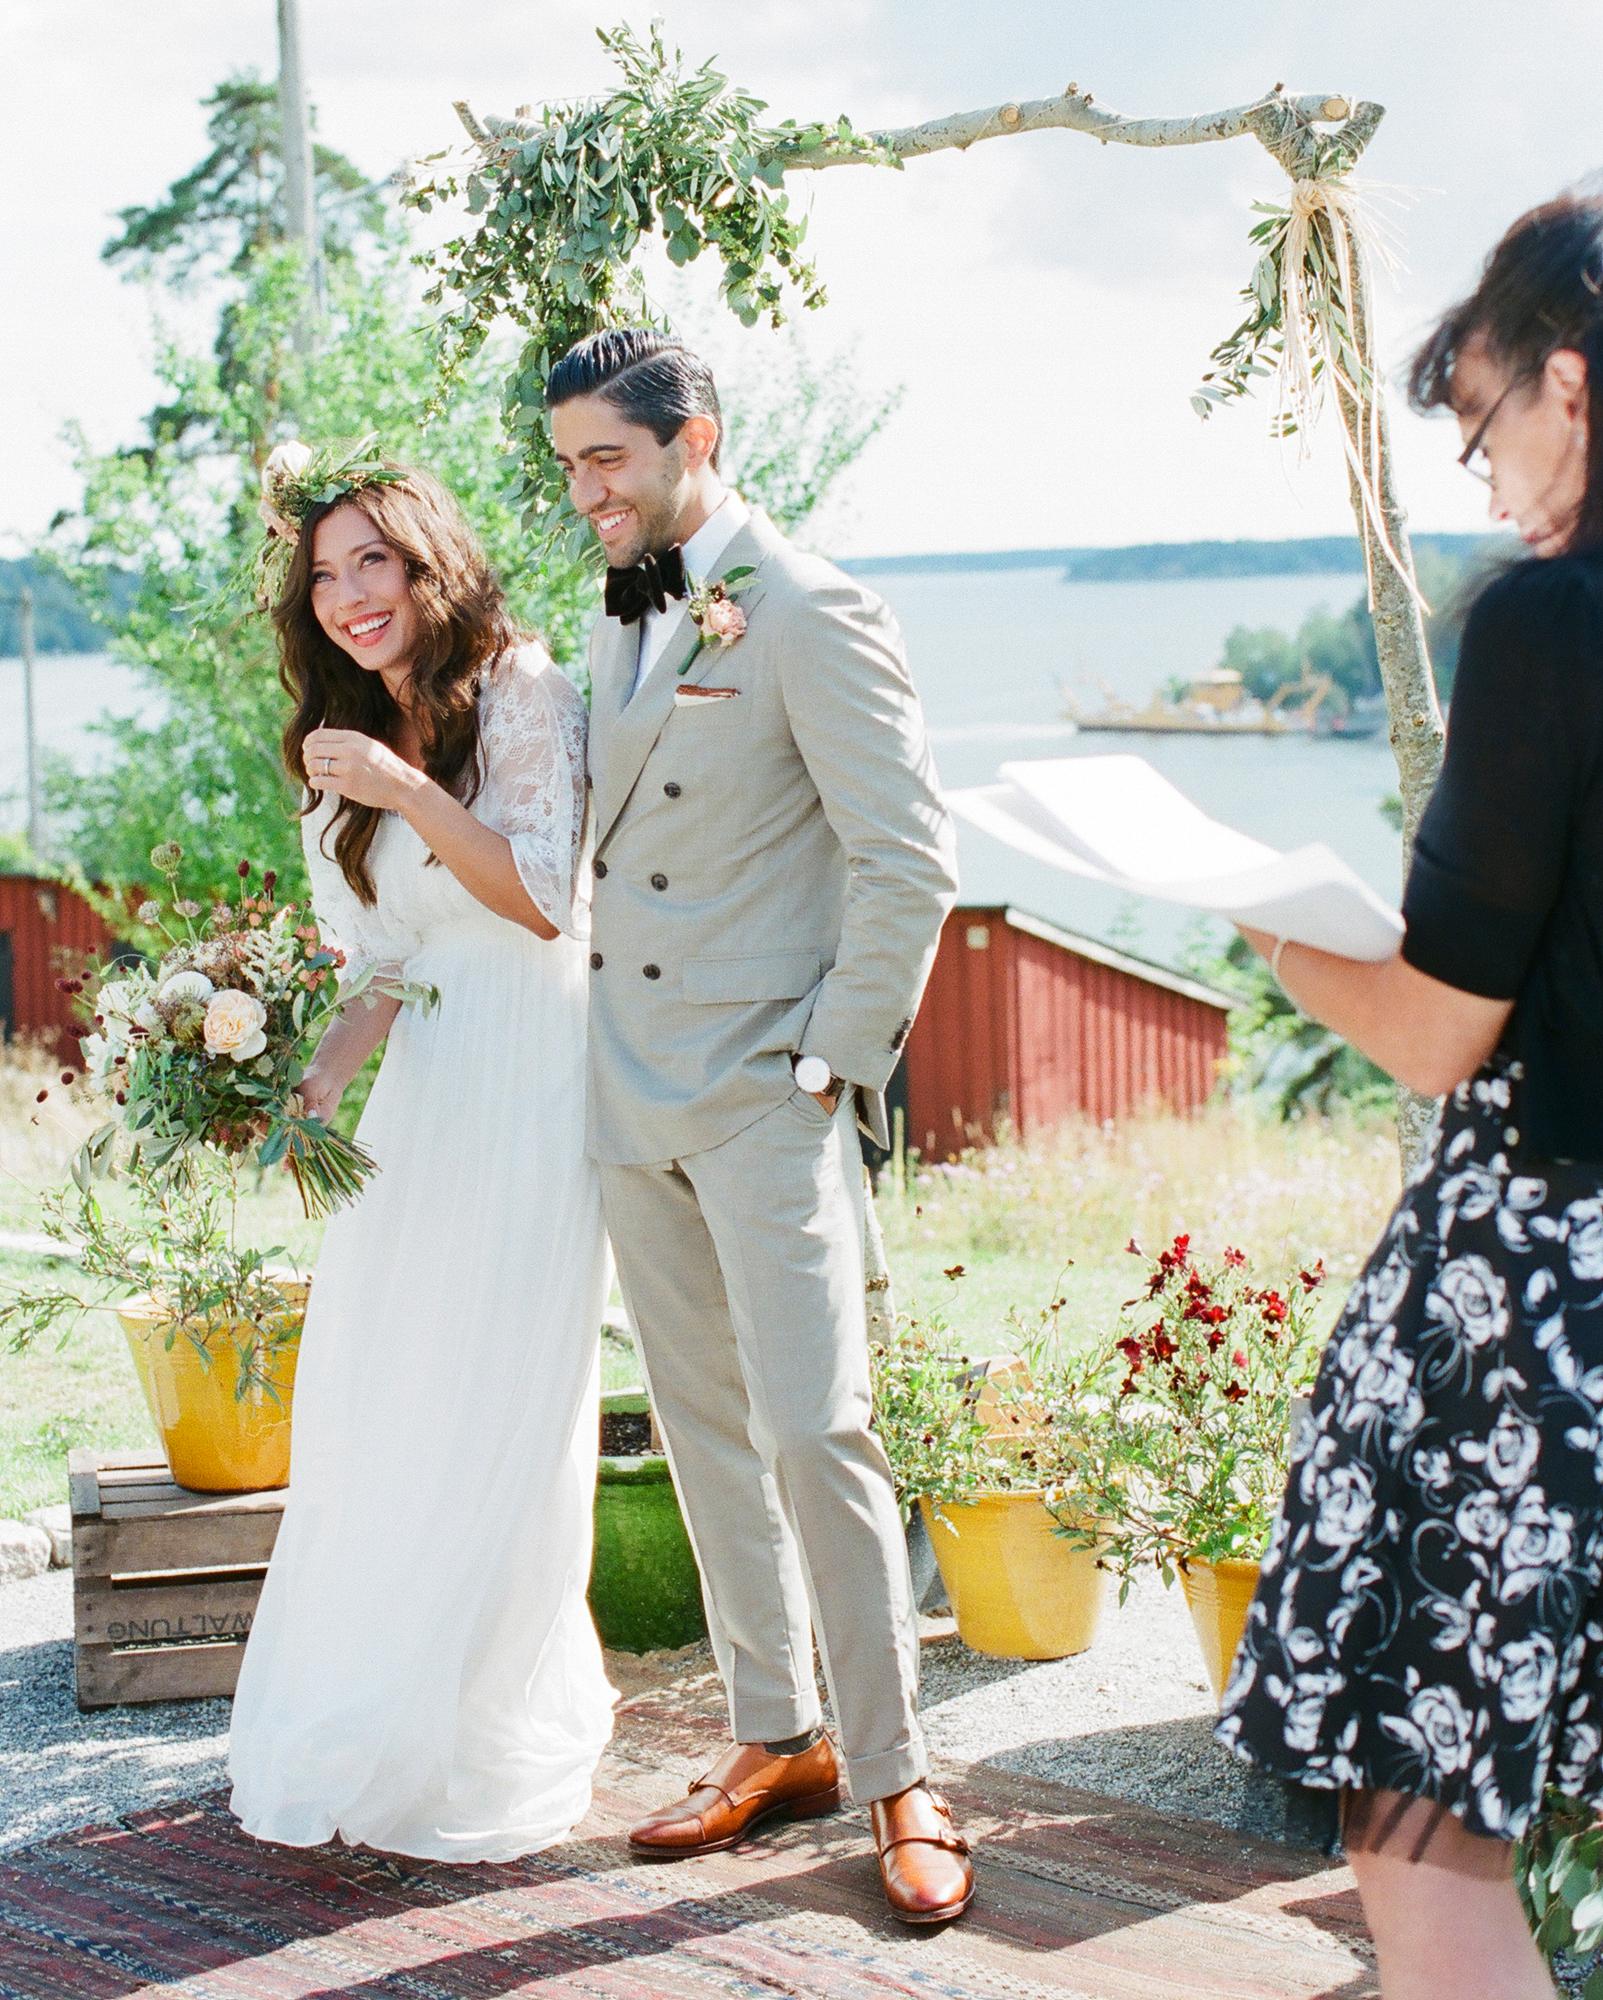 negin-chris-wedding-ceremony-0330-s112116-0815.jpg